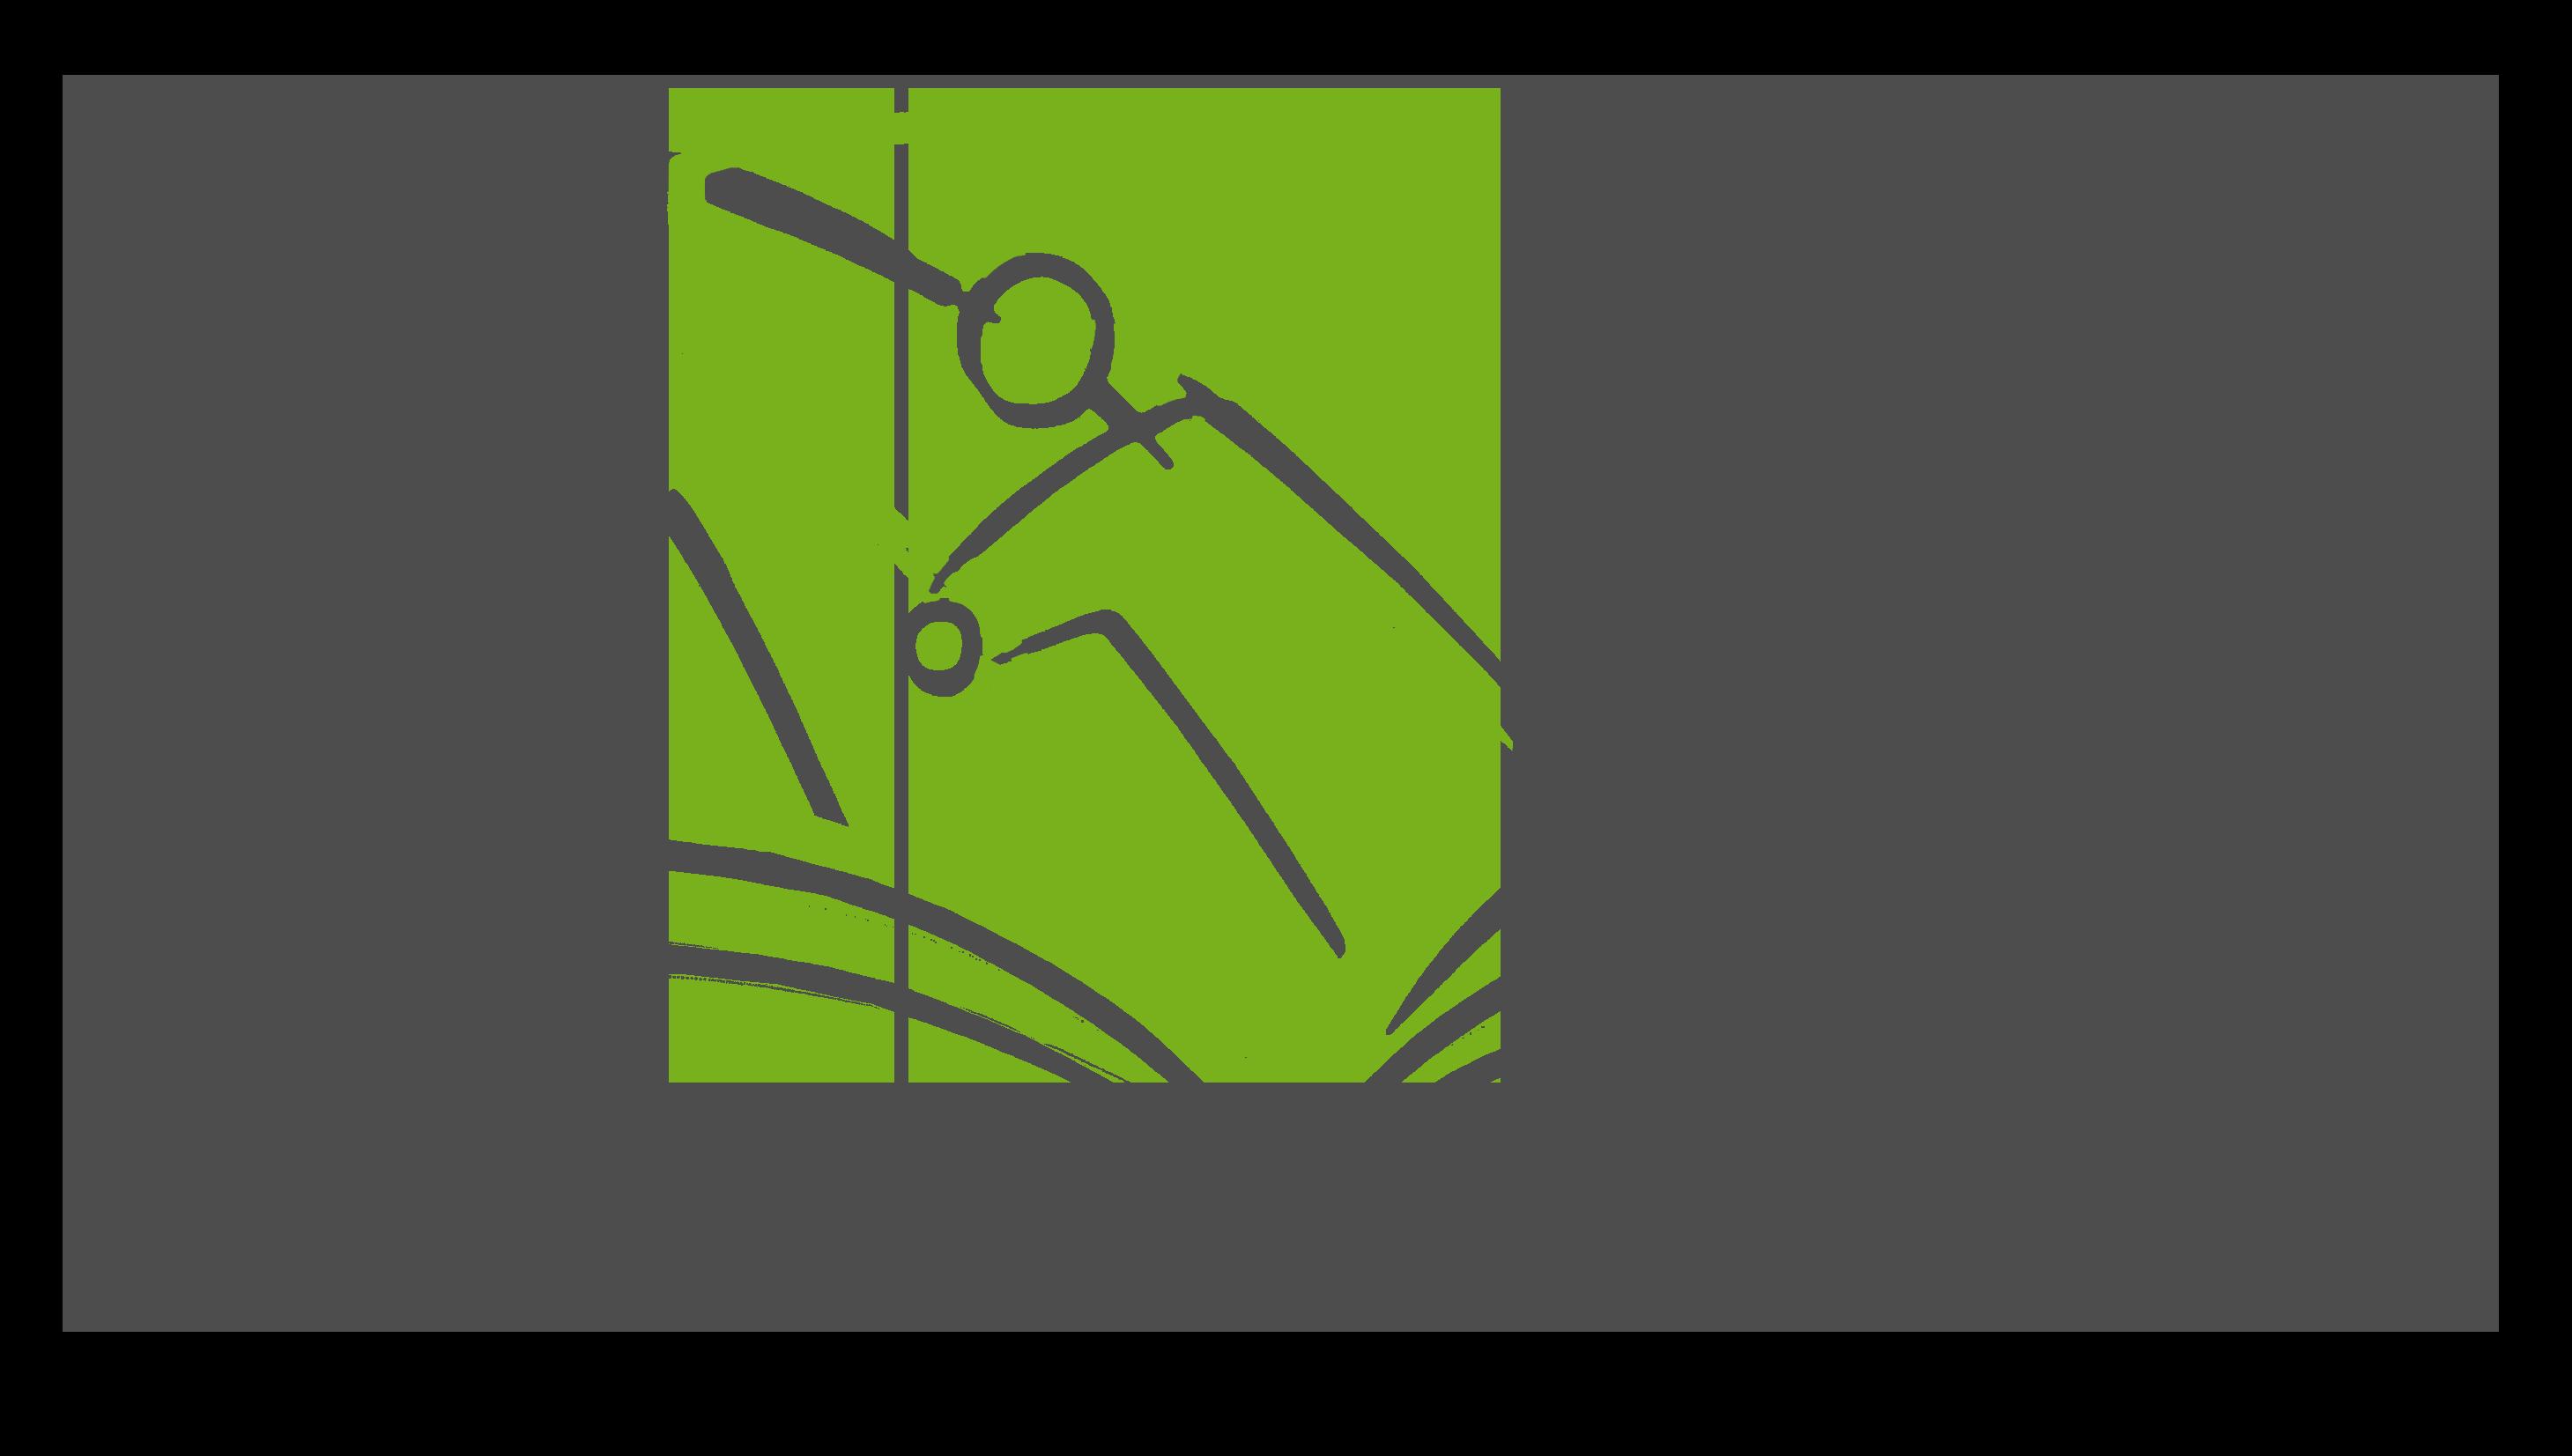 Logo PPRT - Pferdegestützte Pädagogik, Rehabilitation und Therapie e.V.